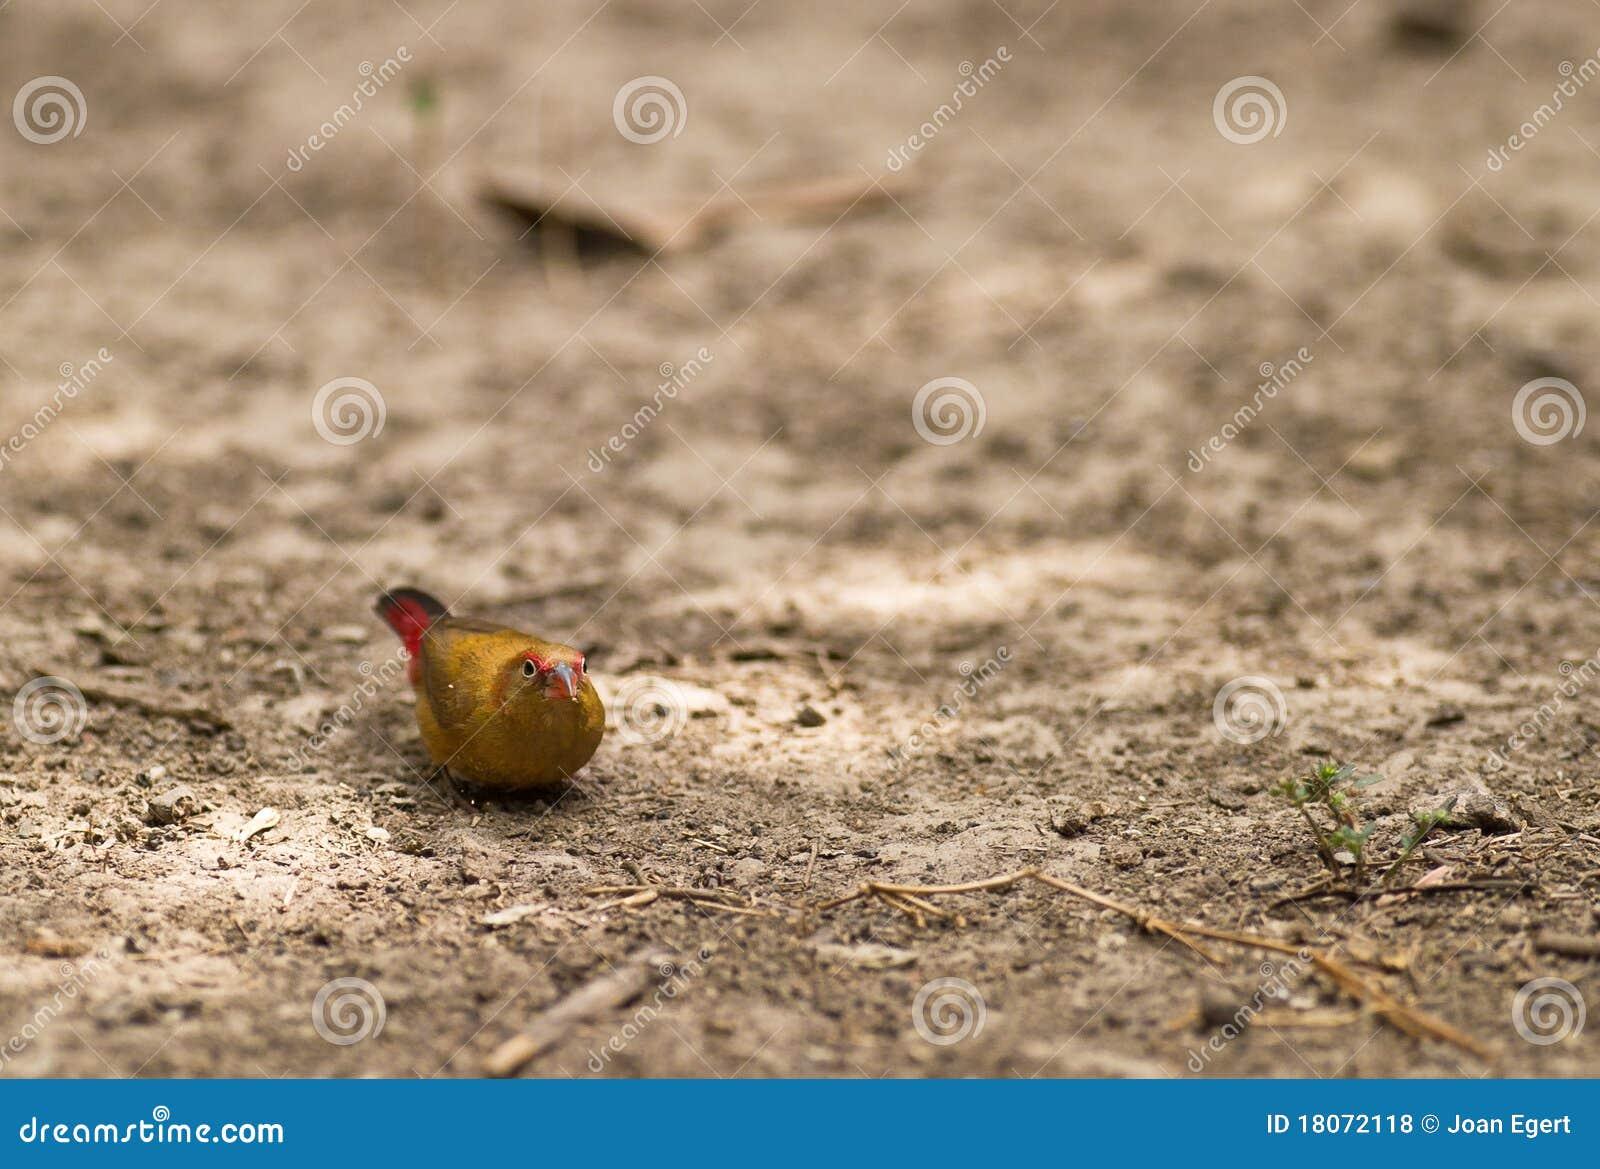 Female Red-billed Fire Finch